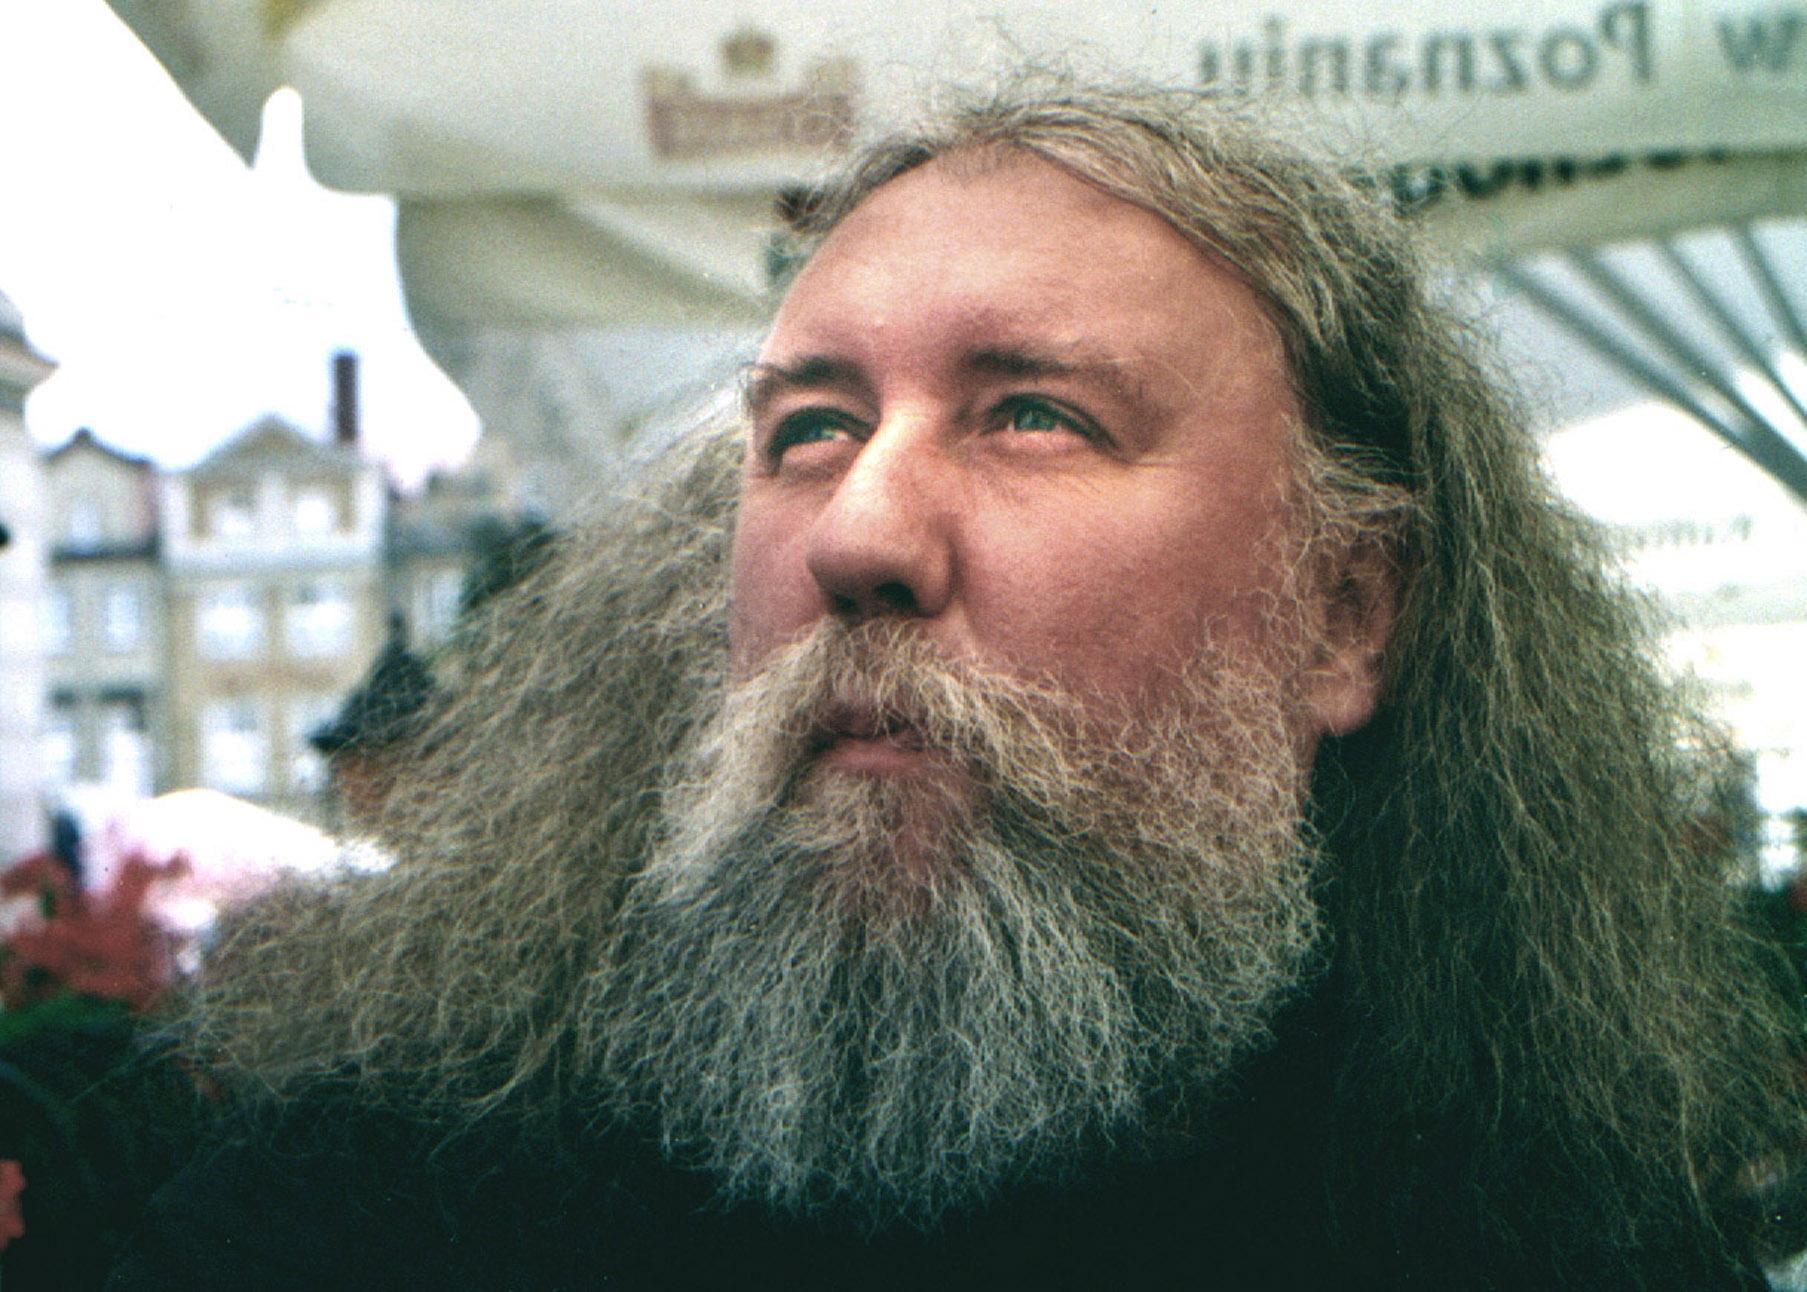 Der Fotograf Peter Homann, 2005 Foto: Gaby Homann/Wikipedia Commons/CC BY-SA 3.0